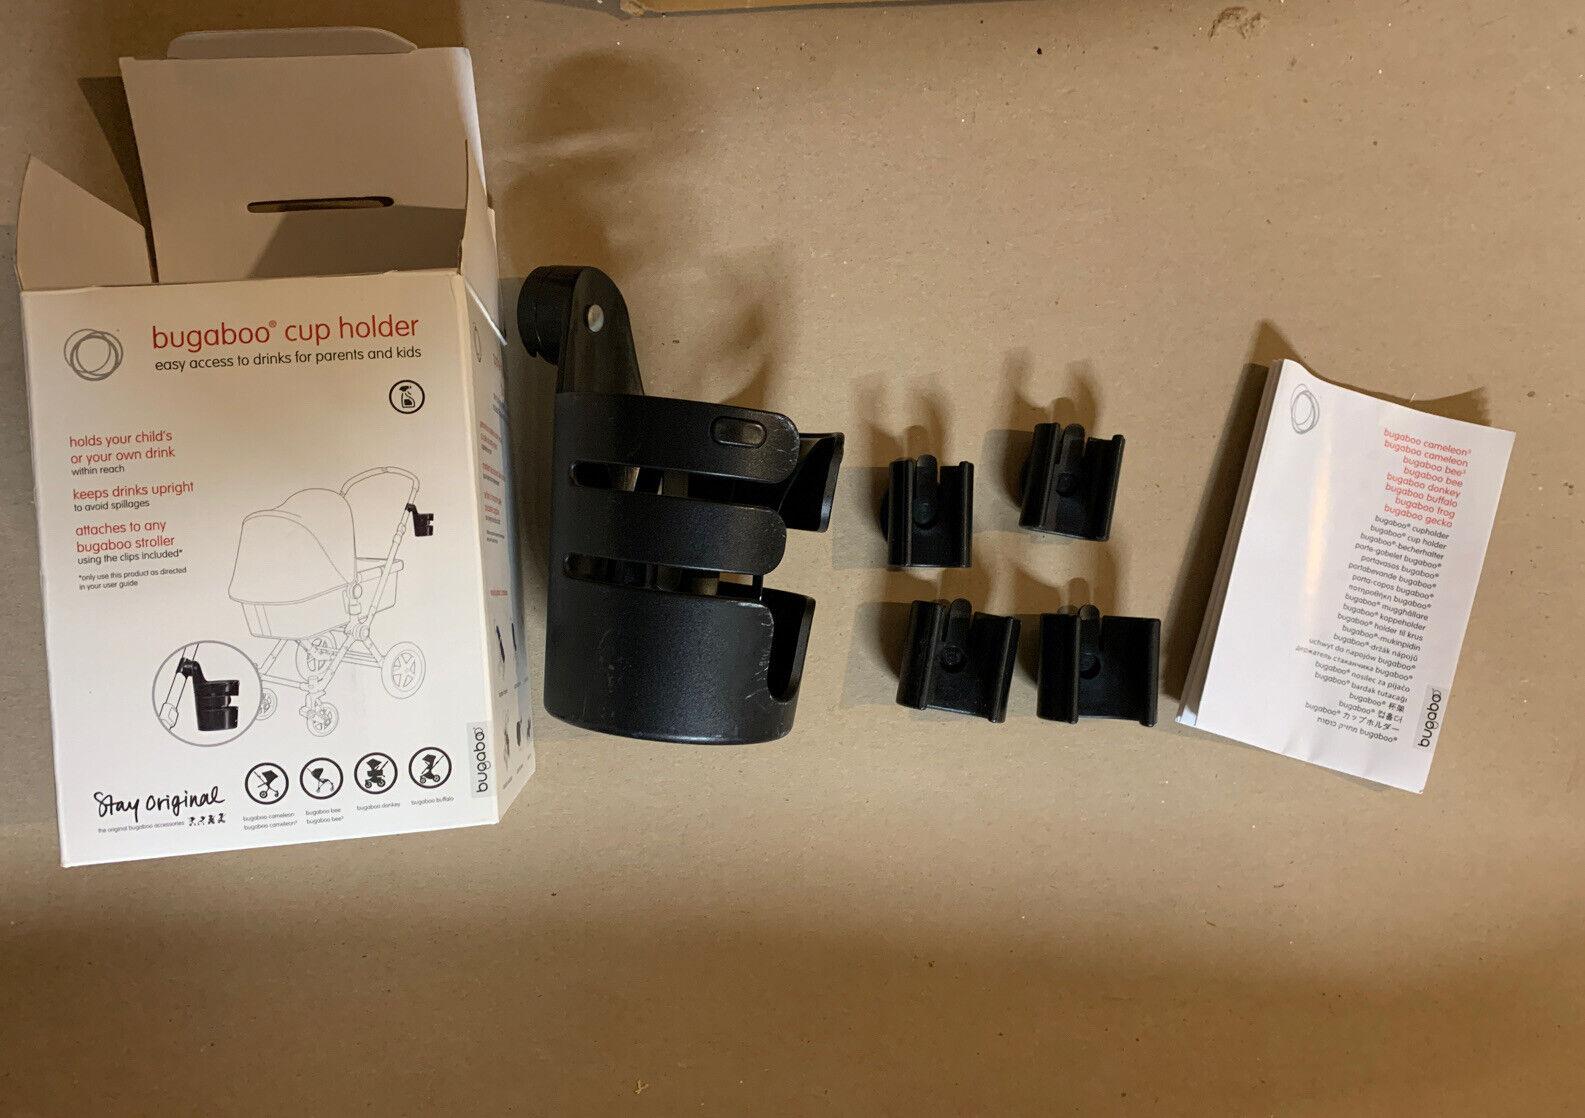 2 3 frog Cameleon stroller cup holder donkey bufallo organizer NEW Bugaboo 1